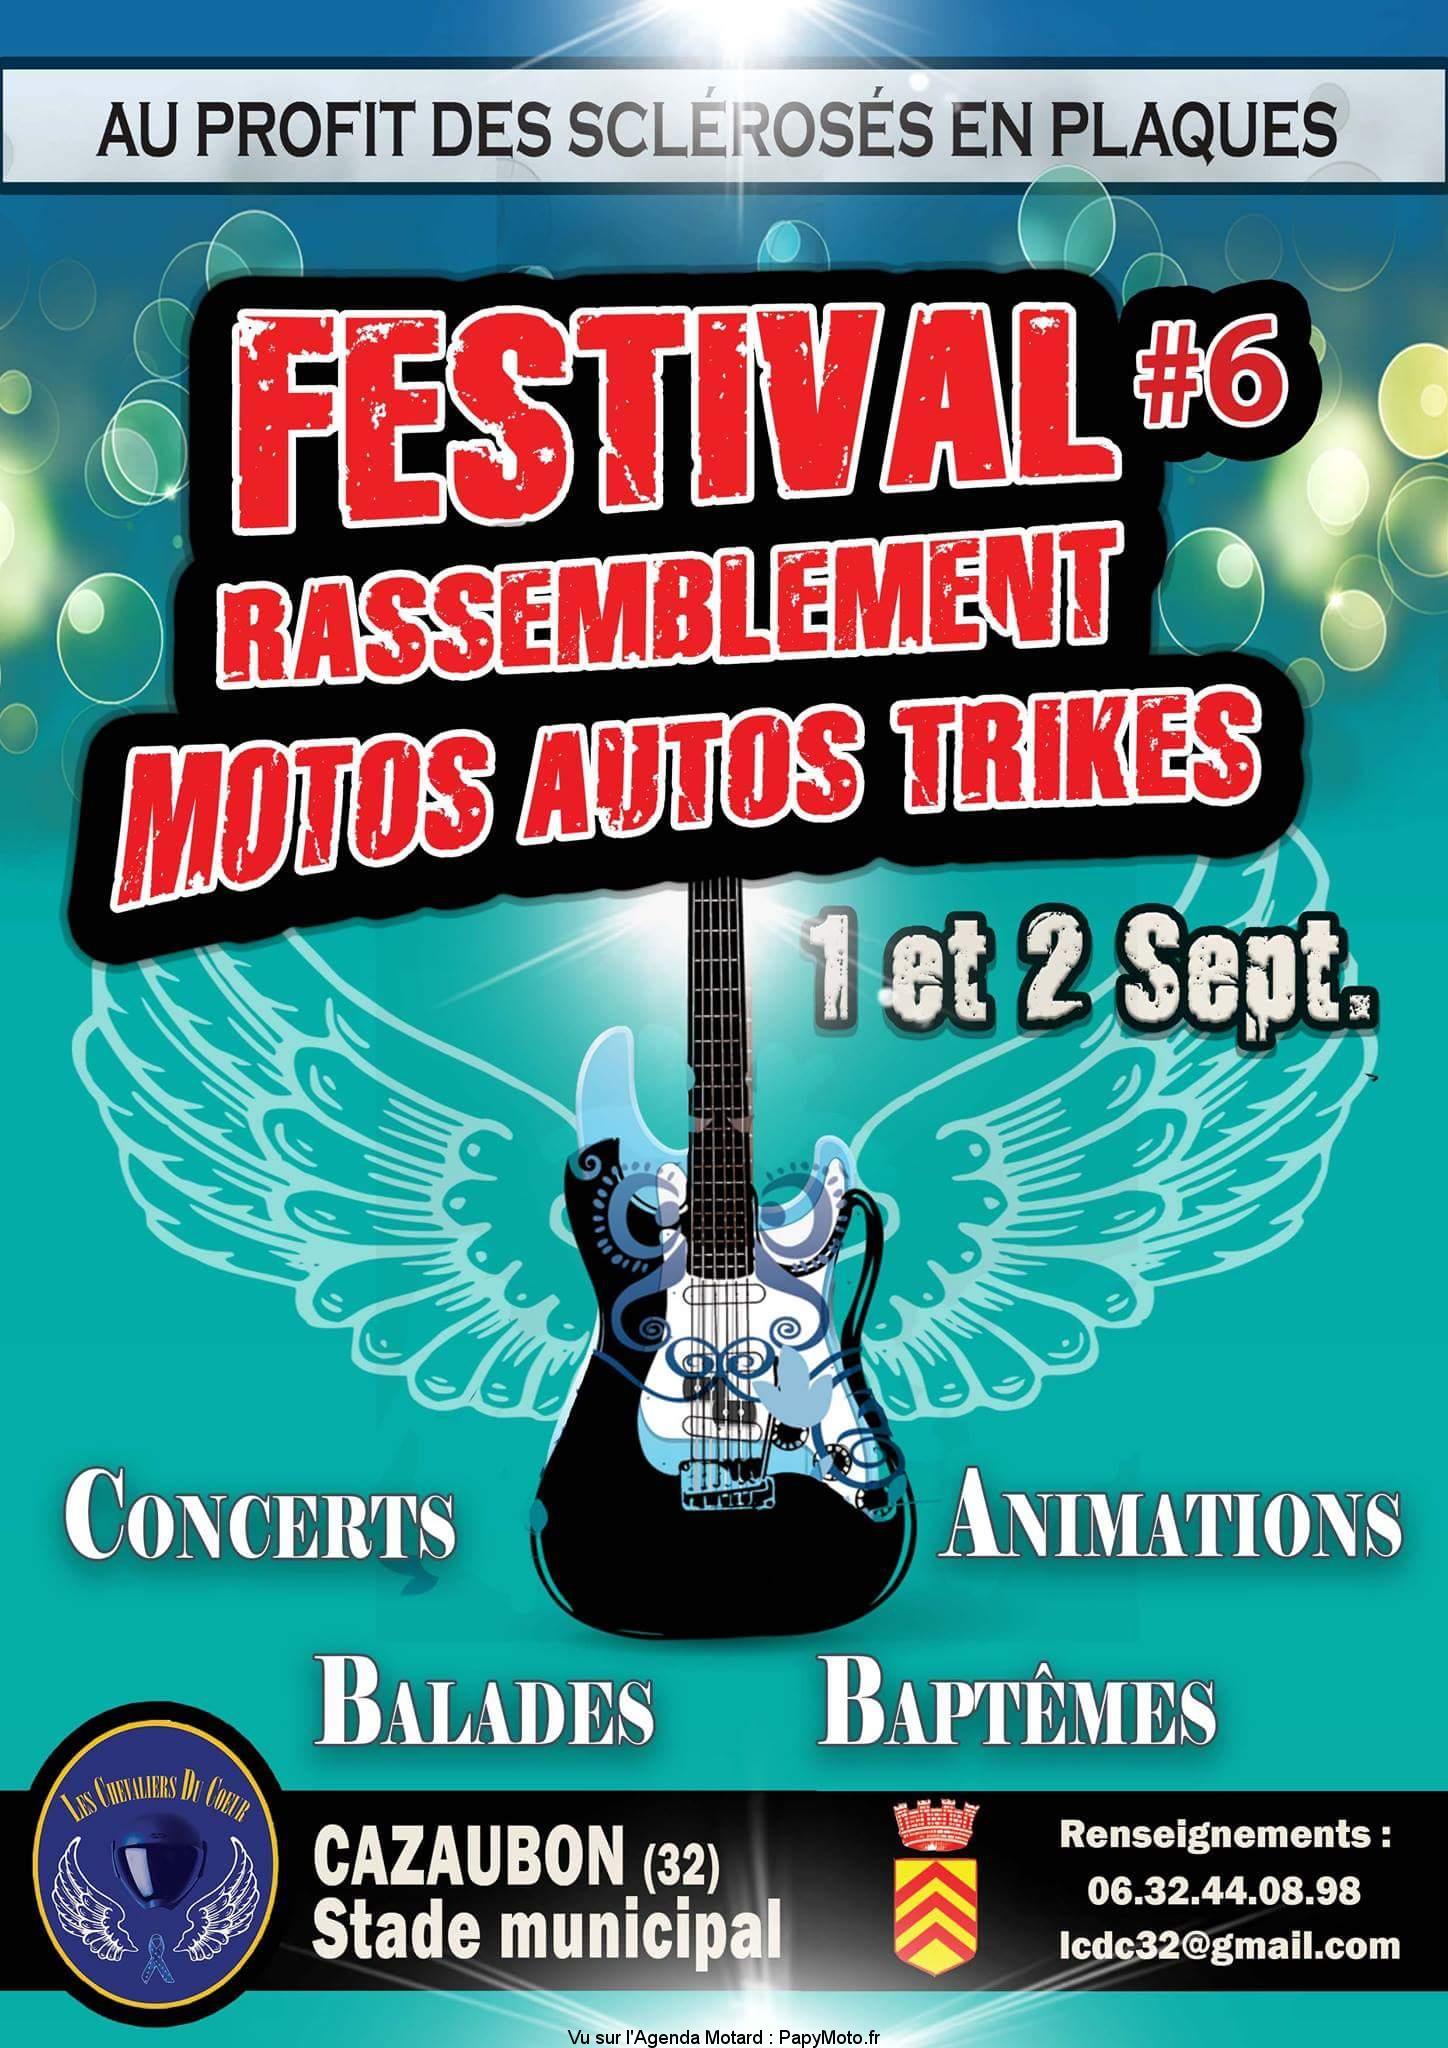 6e Festival Rassemblement Motos Autos Trikes – Cazaubon (32)